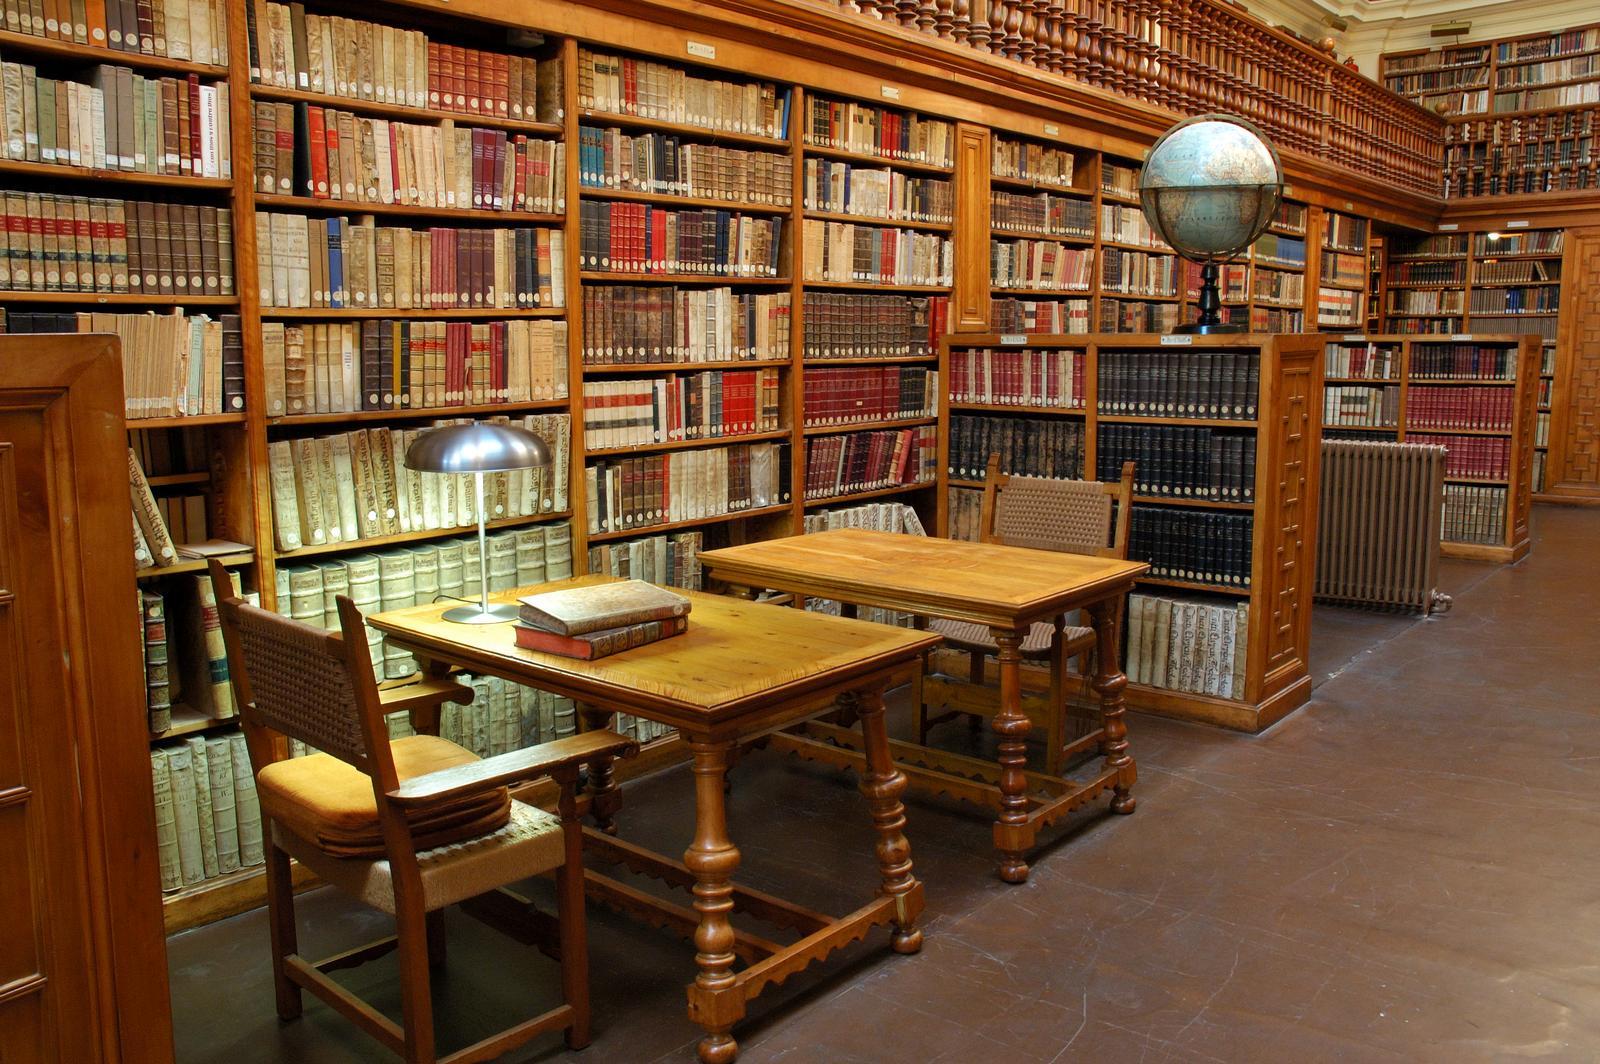 Archivo:Biblioteca-montserrat.jpg